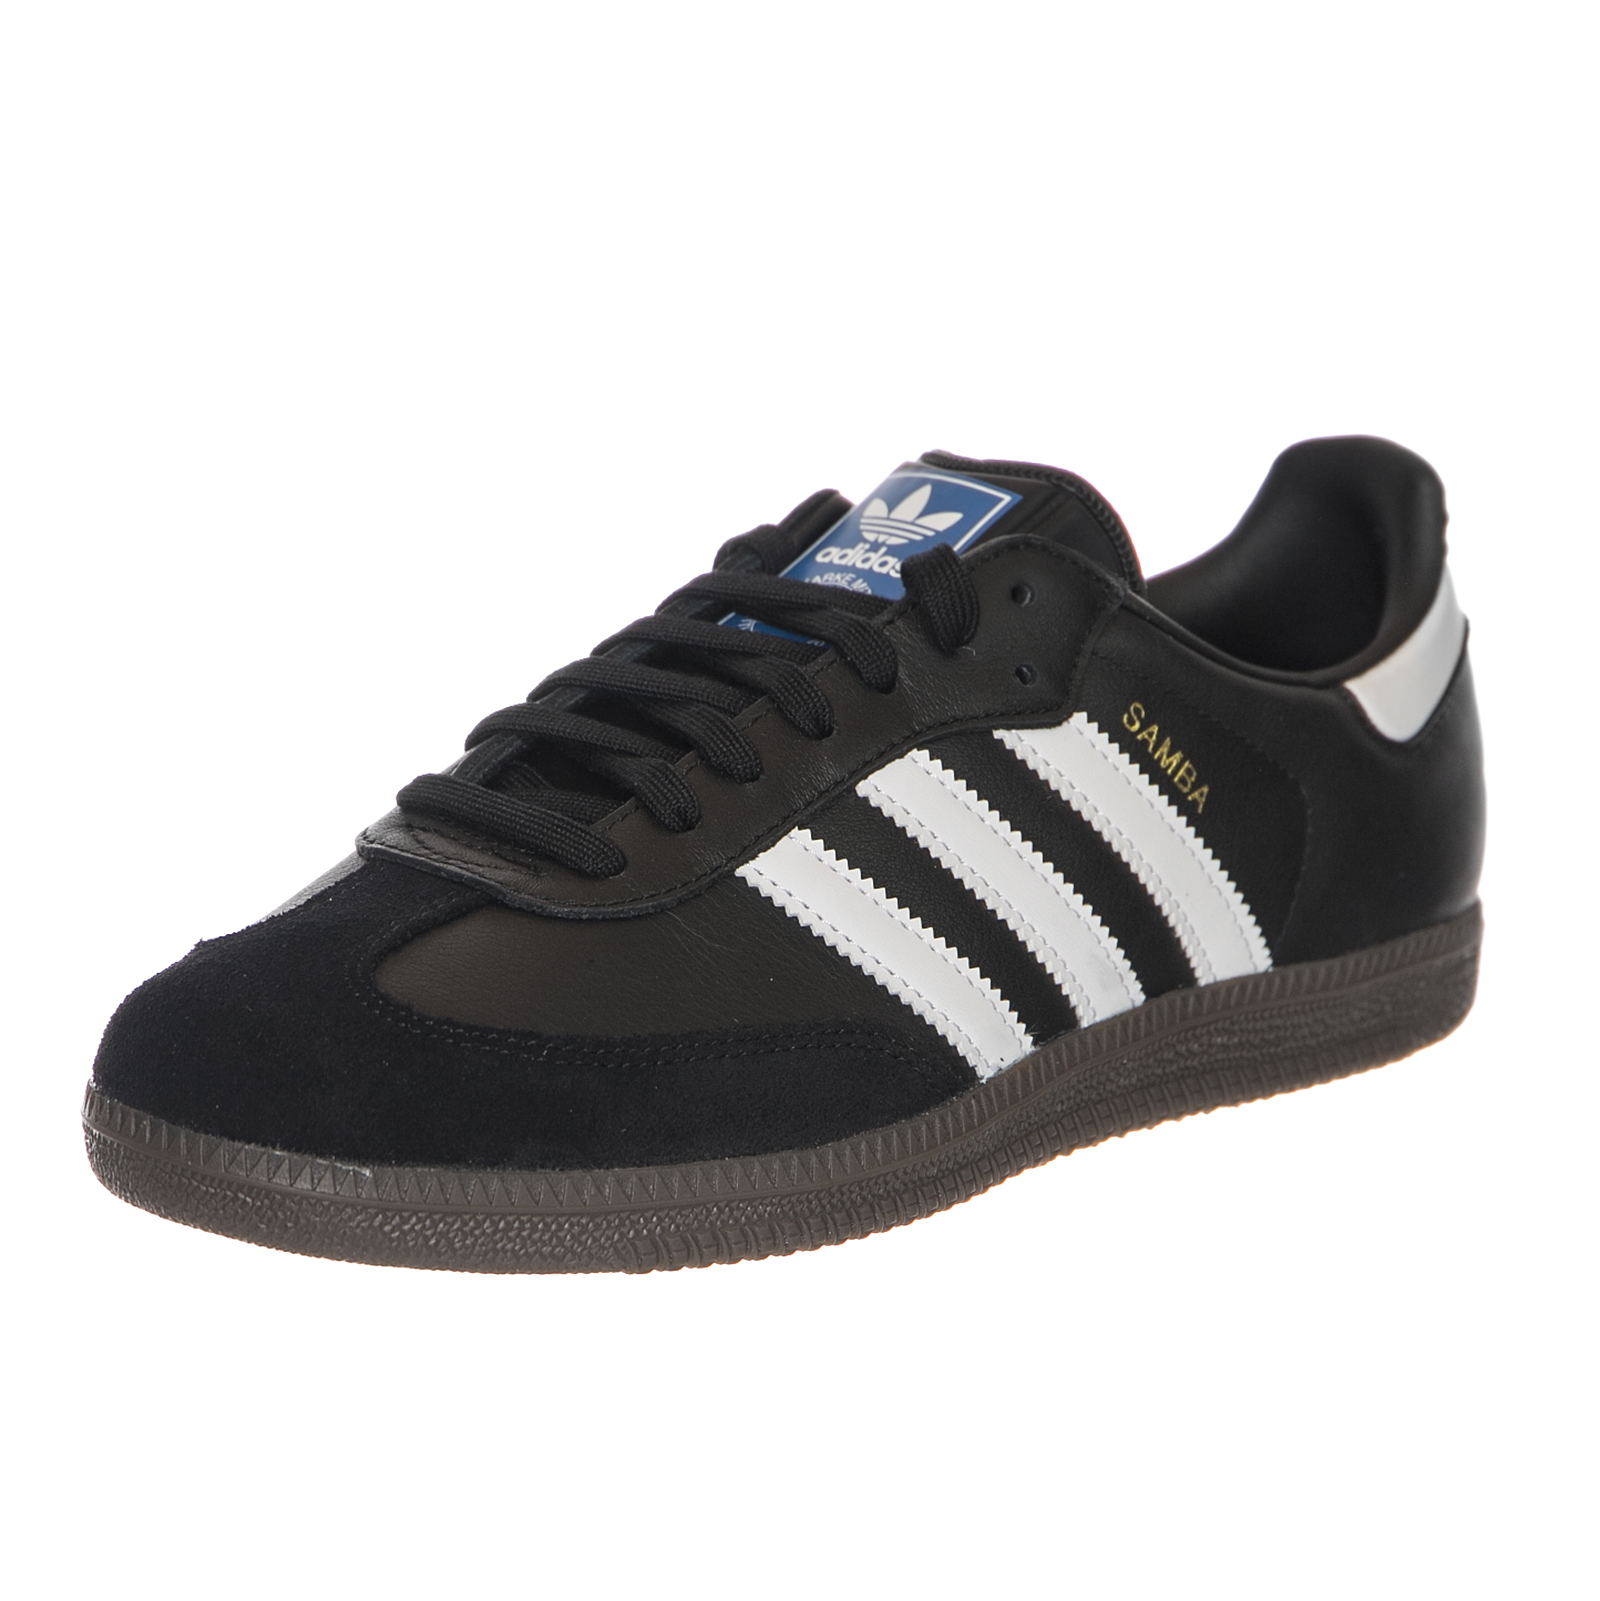 watch 0621e 5266a Adidas Samba Og Cblack Ftwwht Gum5 Nero Nero